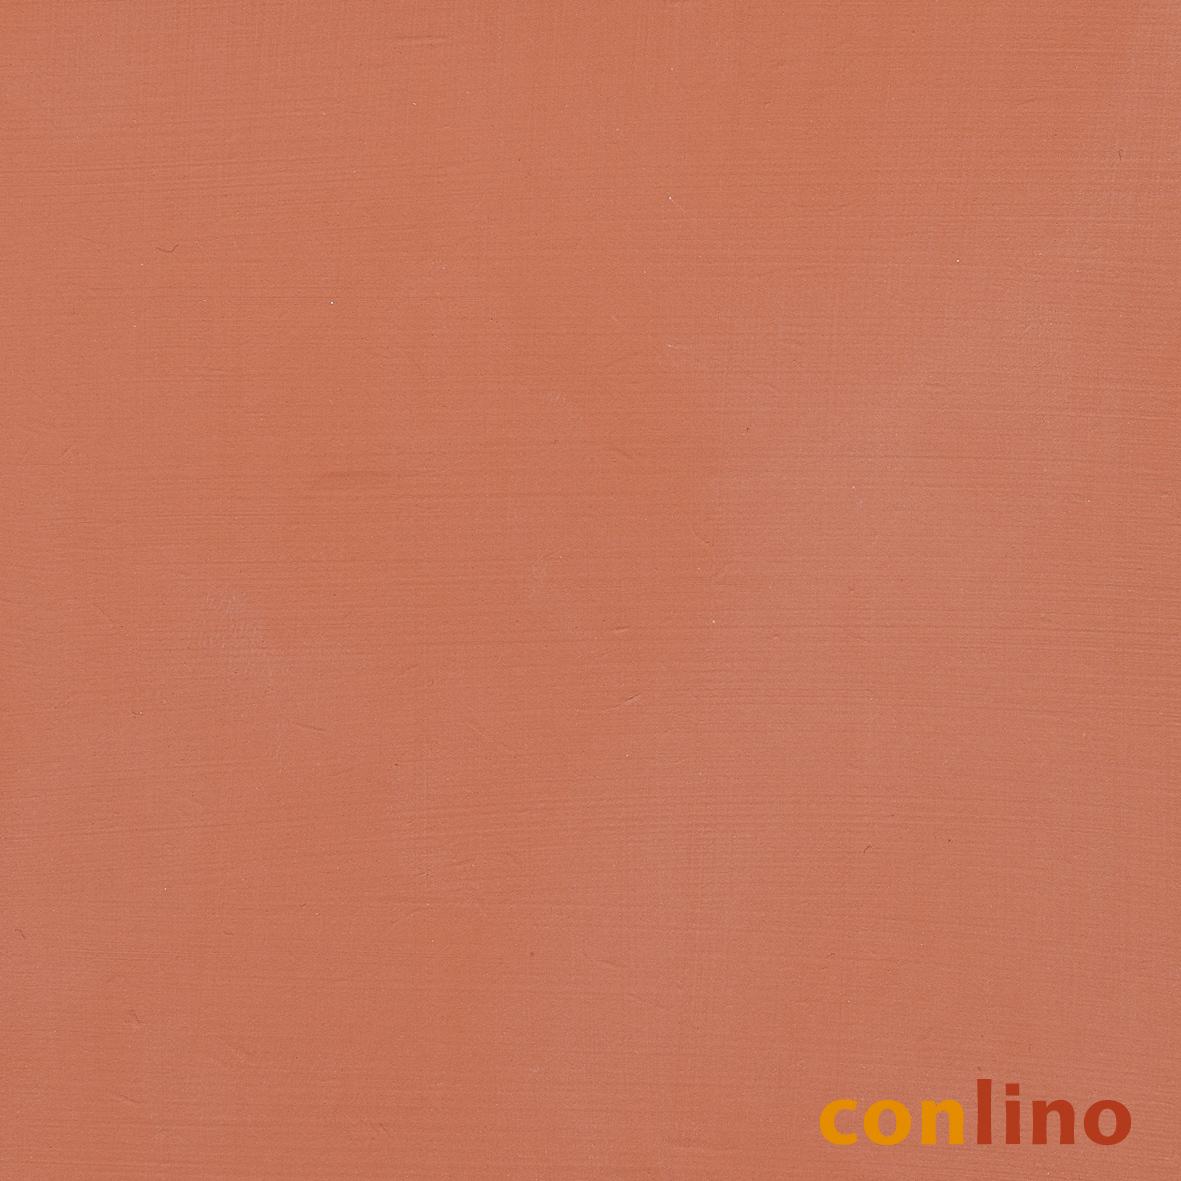 conlino Lehmfarbe Lehmrot CL 120